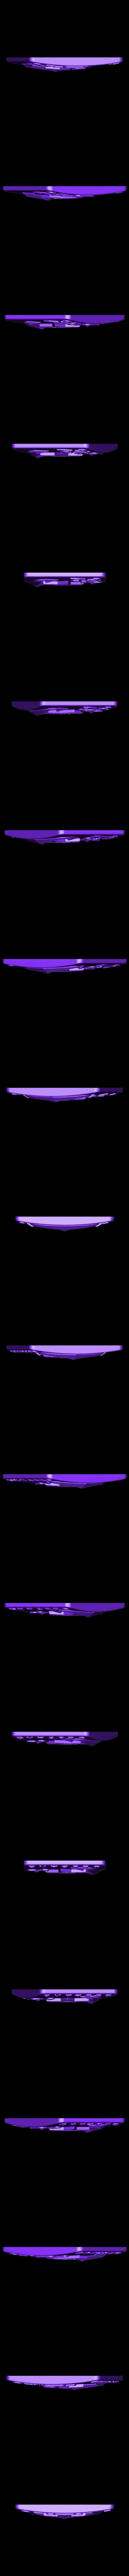 BLAHA2N.stl Download free STL file Солдатские бляхи на 23 февраля (belt buckle) • Model to 3D print, shuranikishin